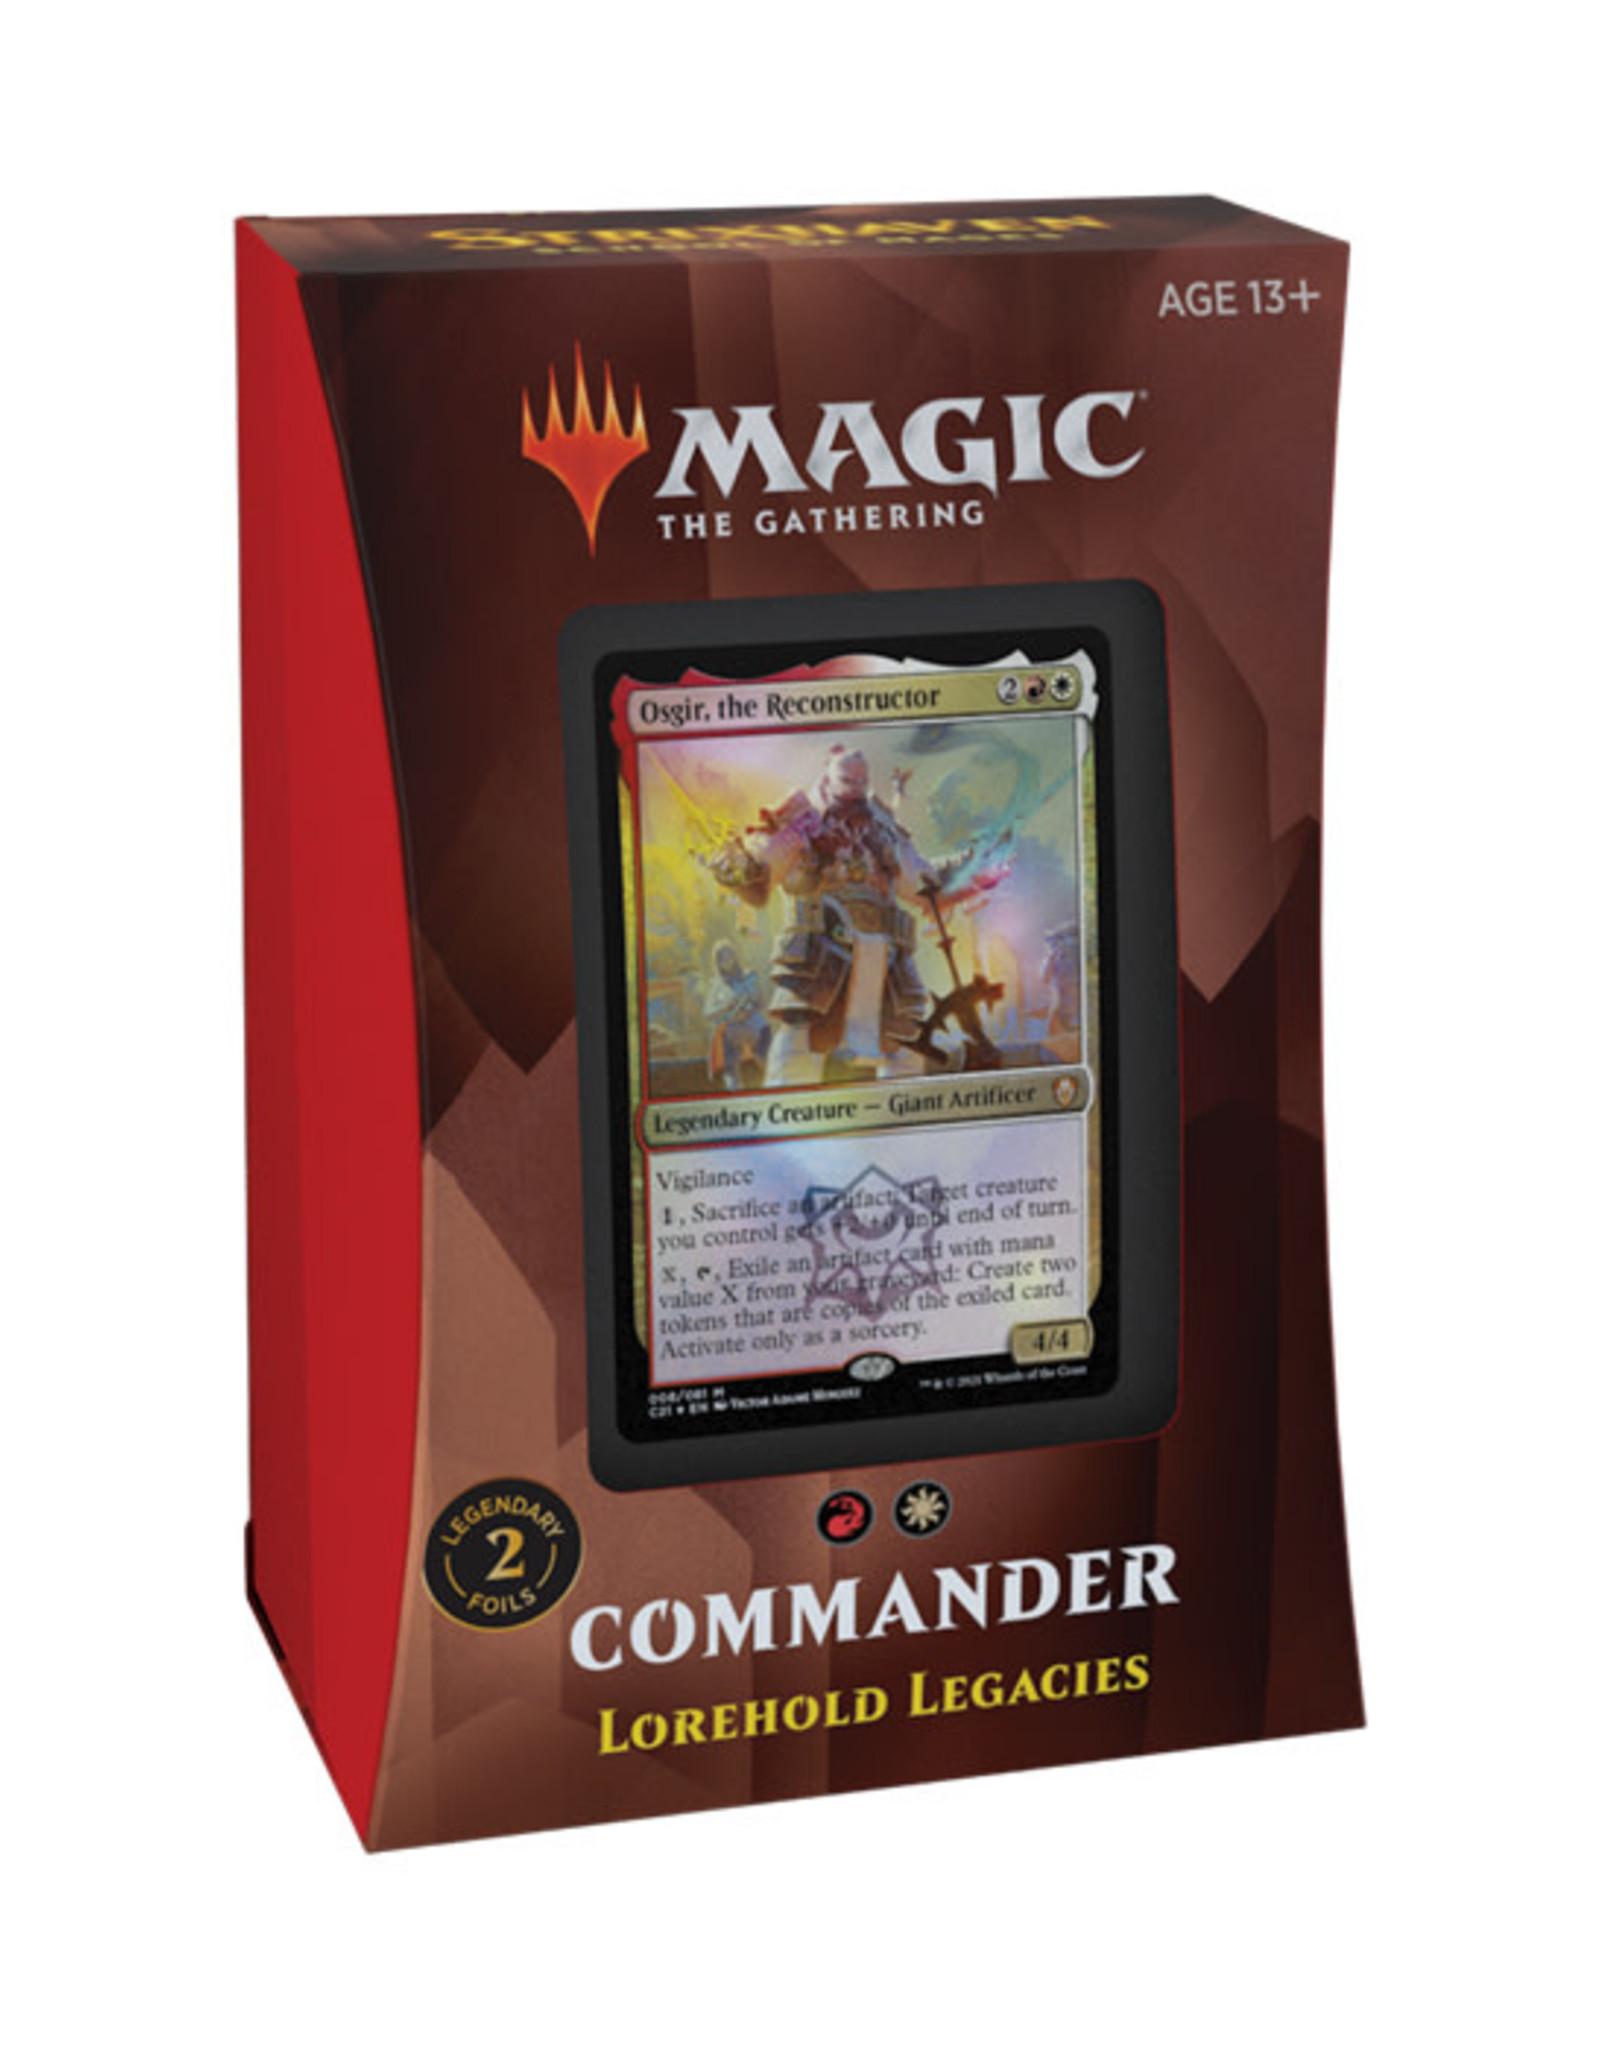 Magic: The Gathering Magic: The Gathering - Strixhaven - Commander Deck - Lorehold Legacies